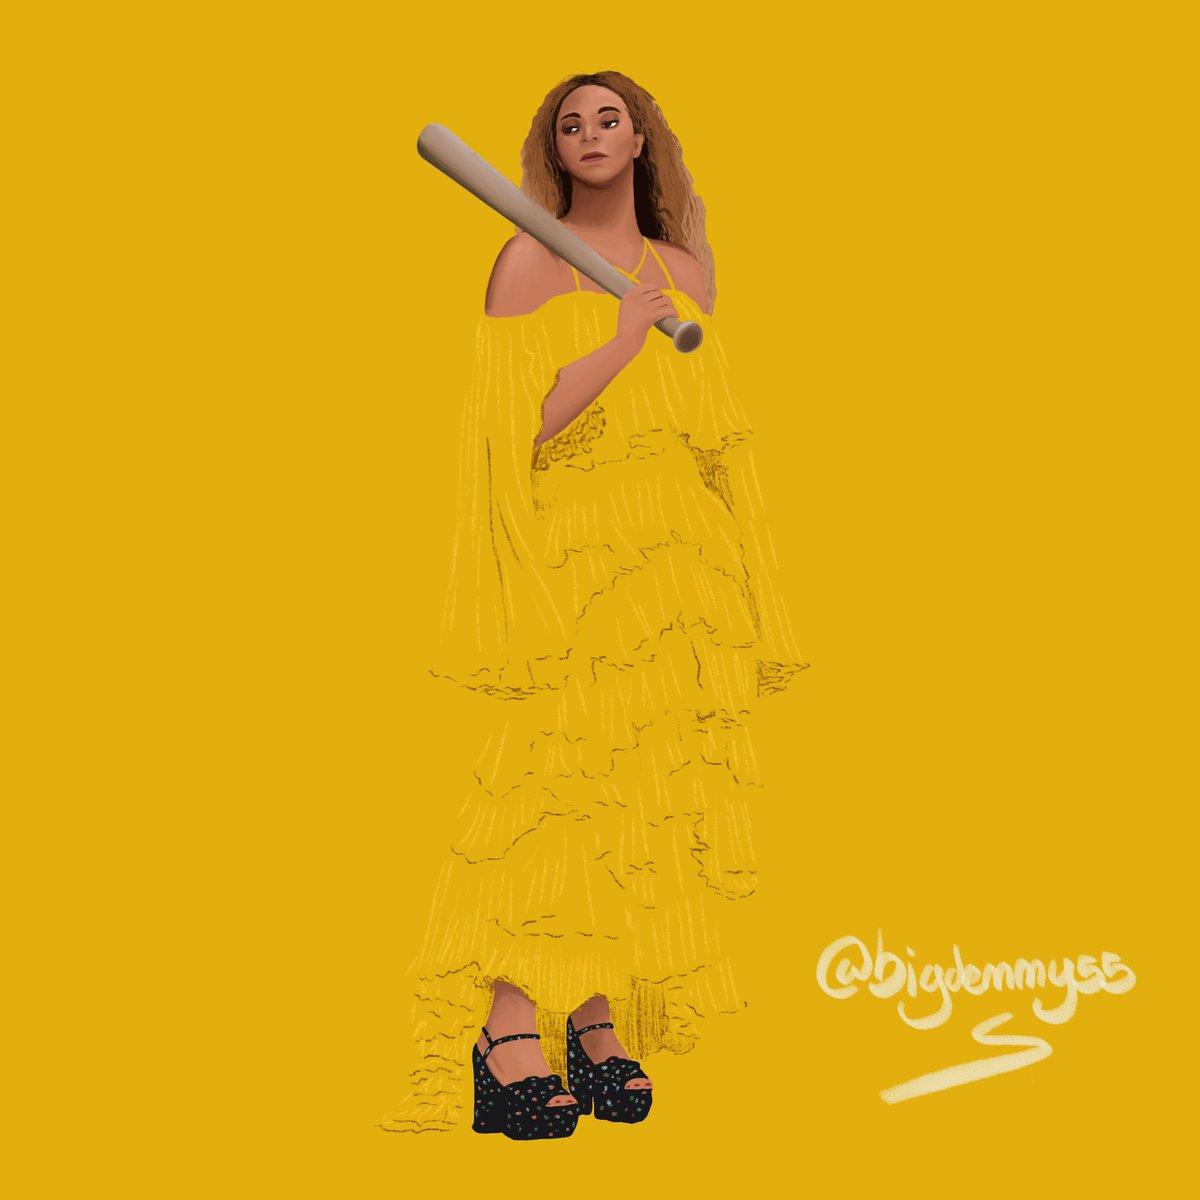 Dessin de Beyonce  J'ai plus de dessins sur ma compte insta: bigdenny55  #dessin #Beyonce #lemonade #sketch